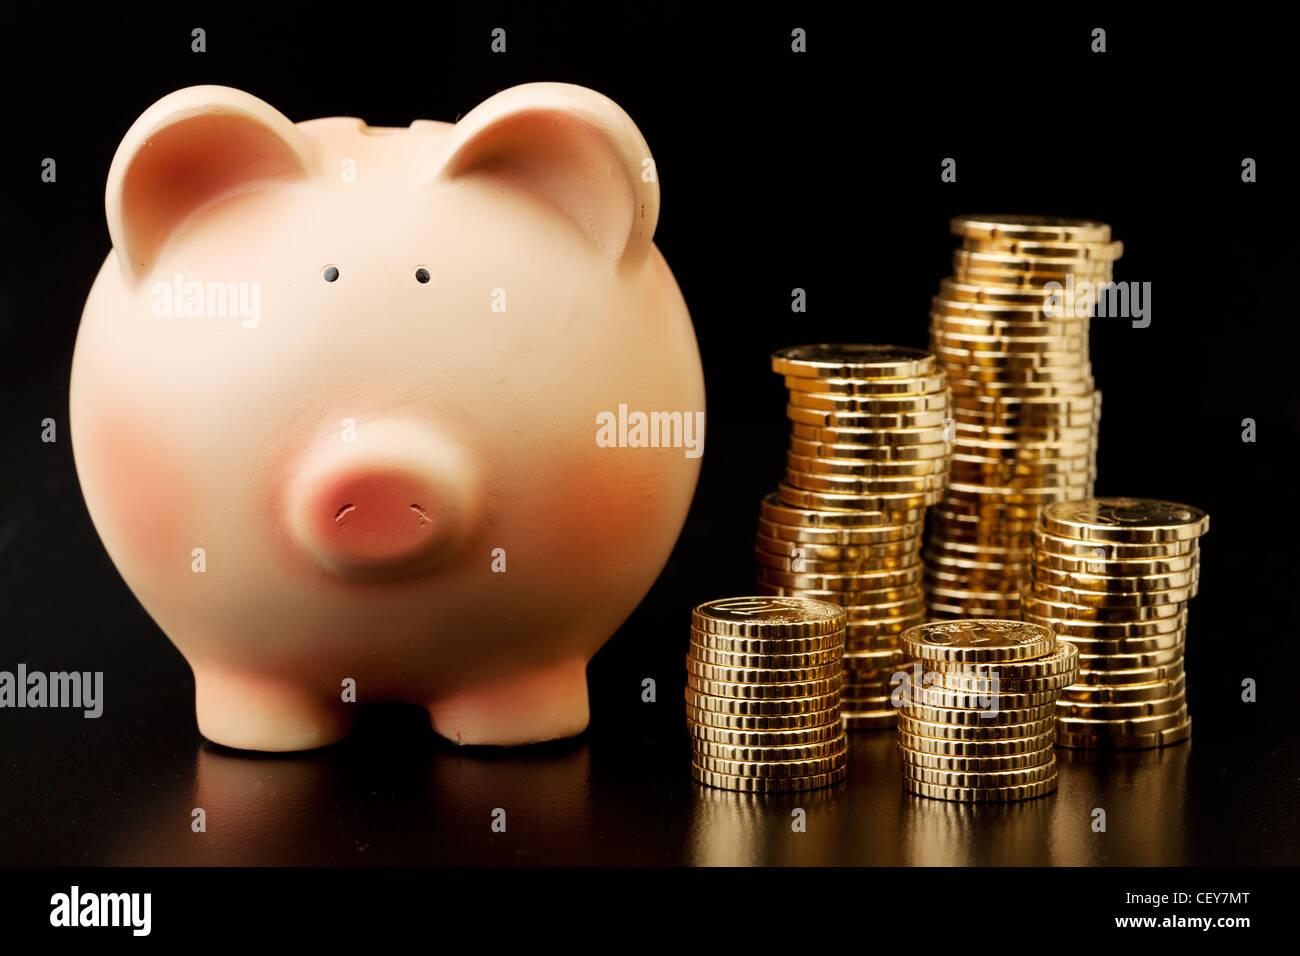 saving money - Stock Image